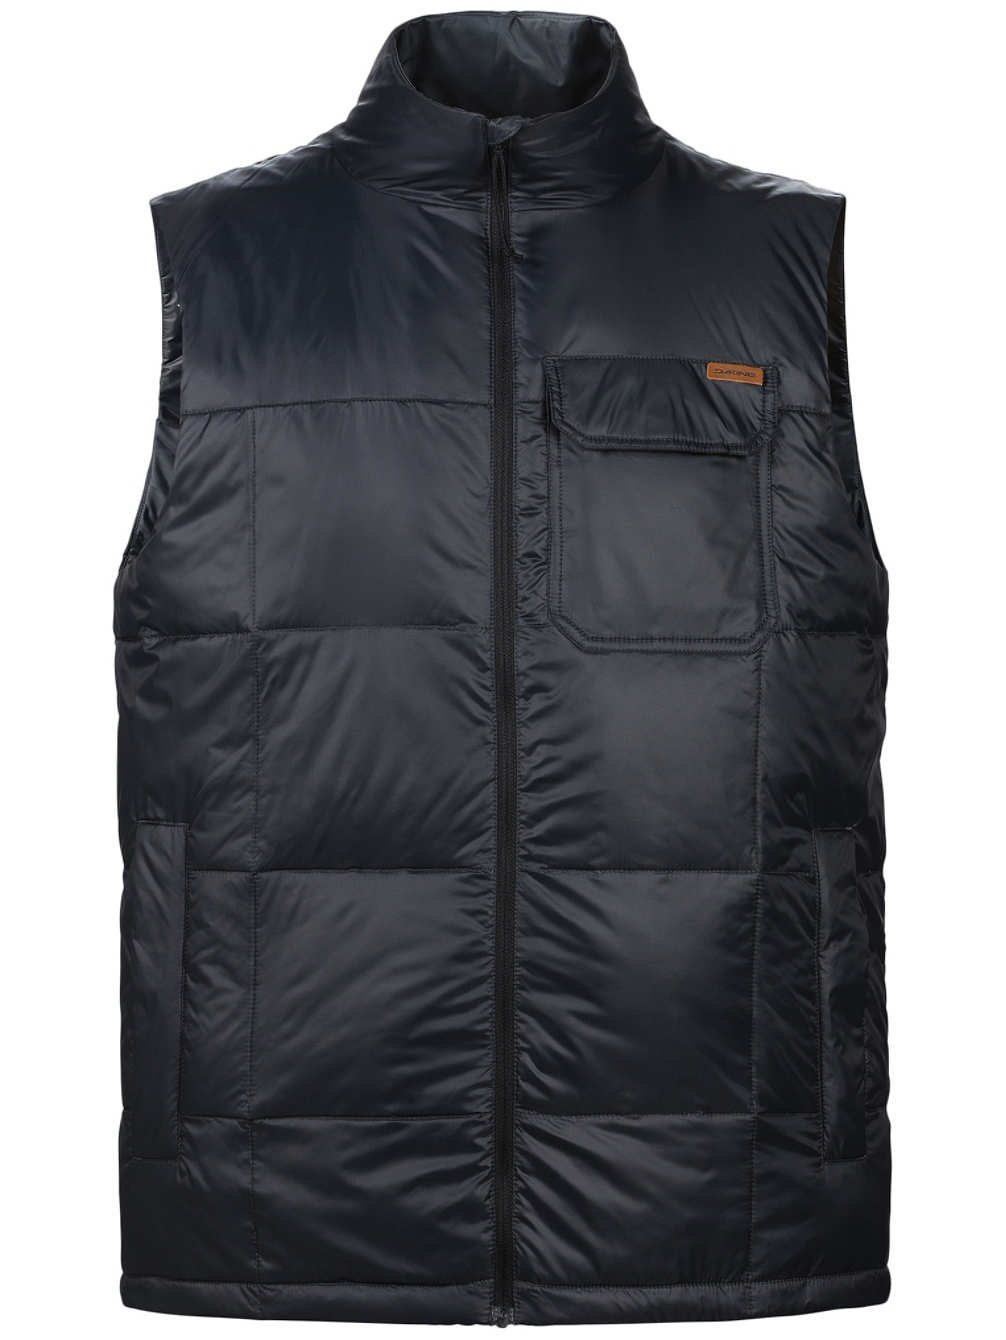 Dakine Men's Brightwood Compressible Down Vest, Black, M